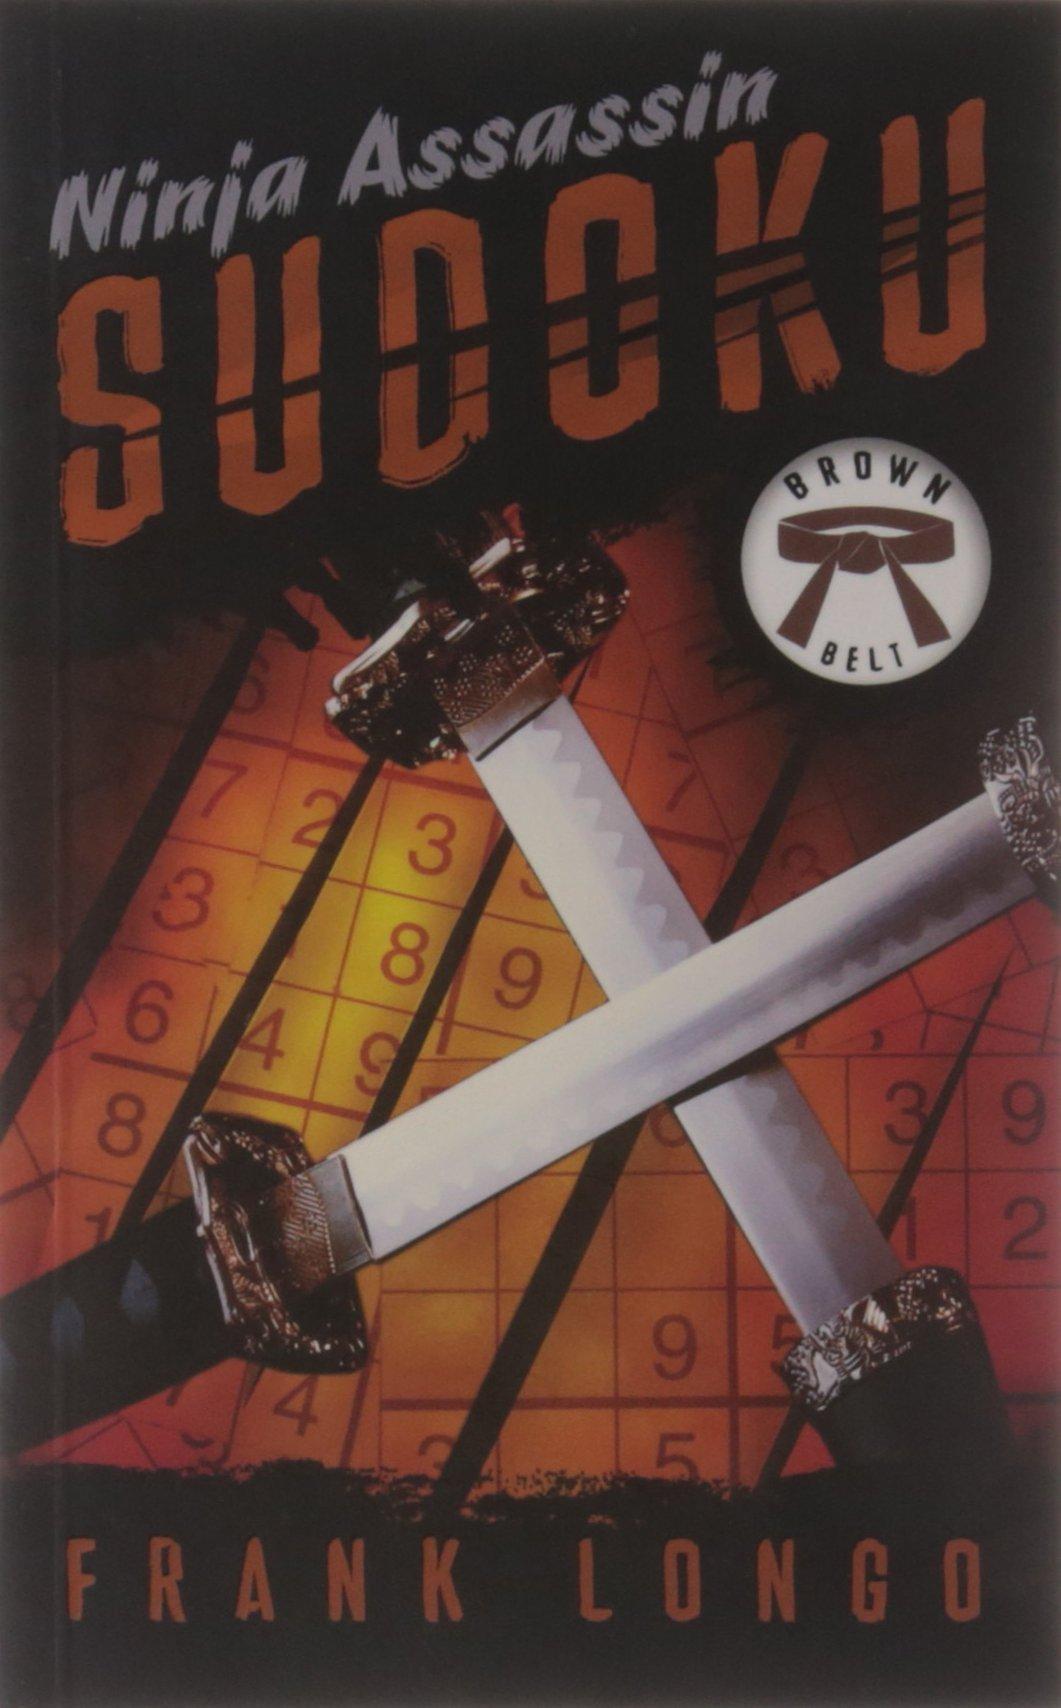 Ninja Assassin Sudoku: Brown Belt: Amazon.es: Frank Longo ...